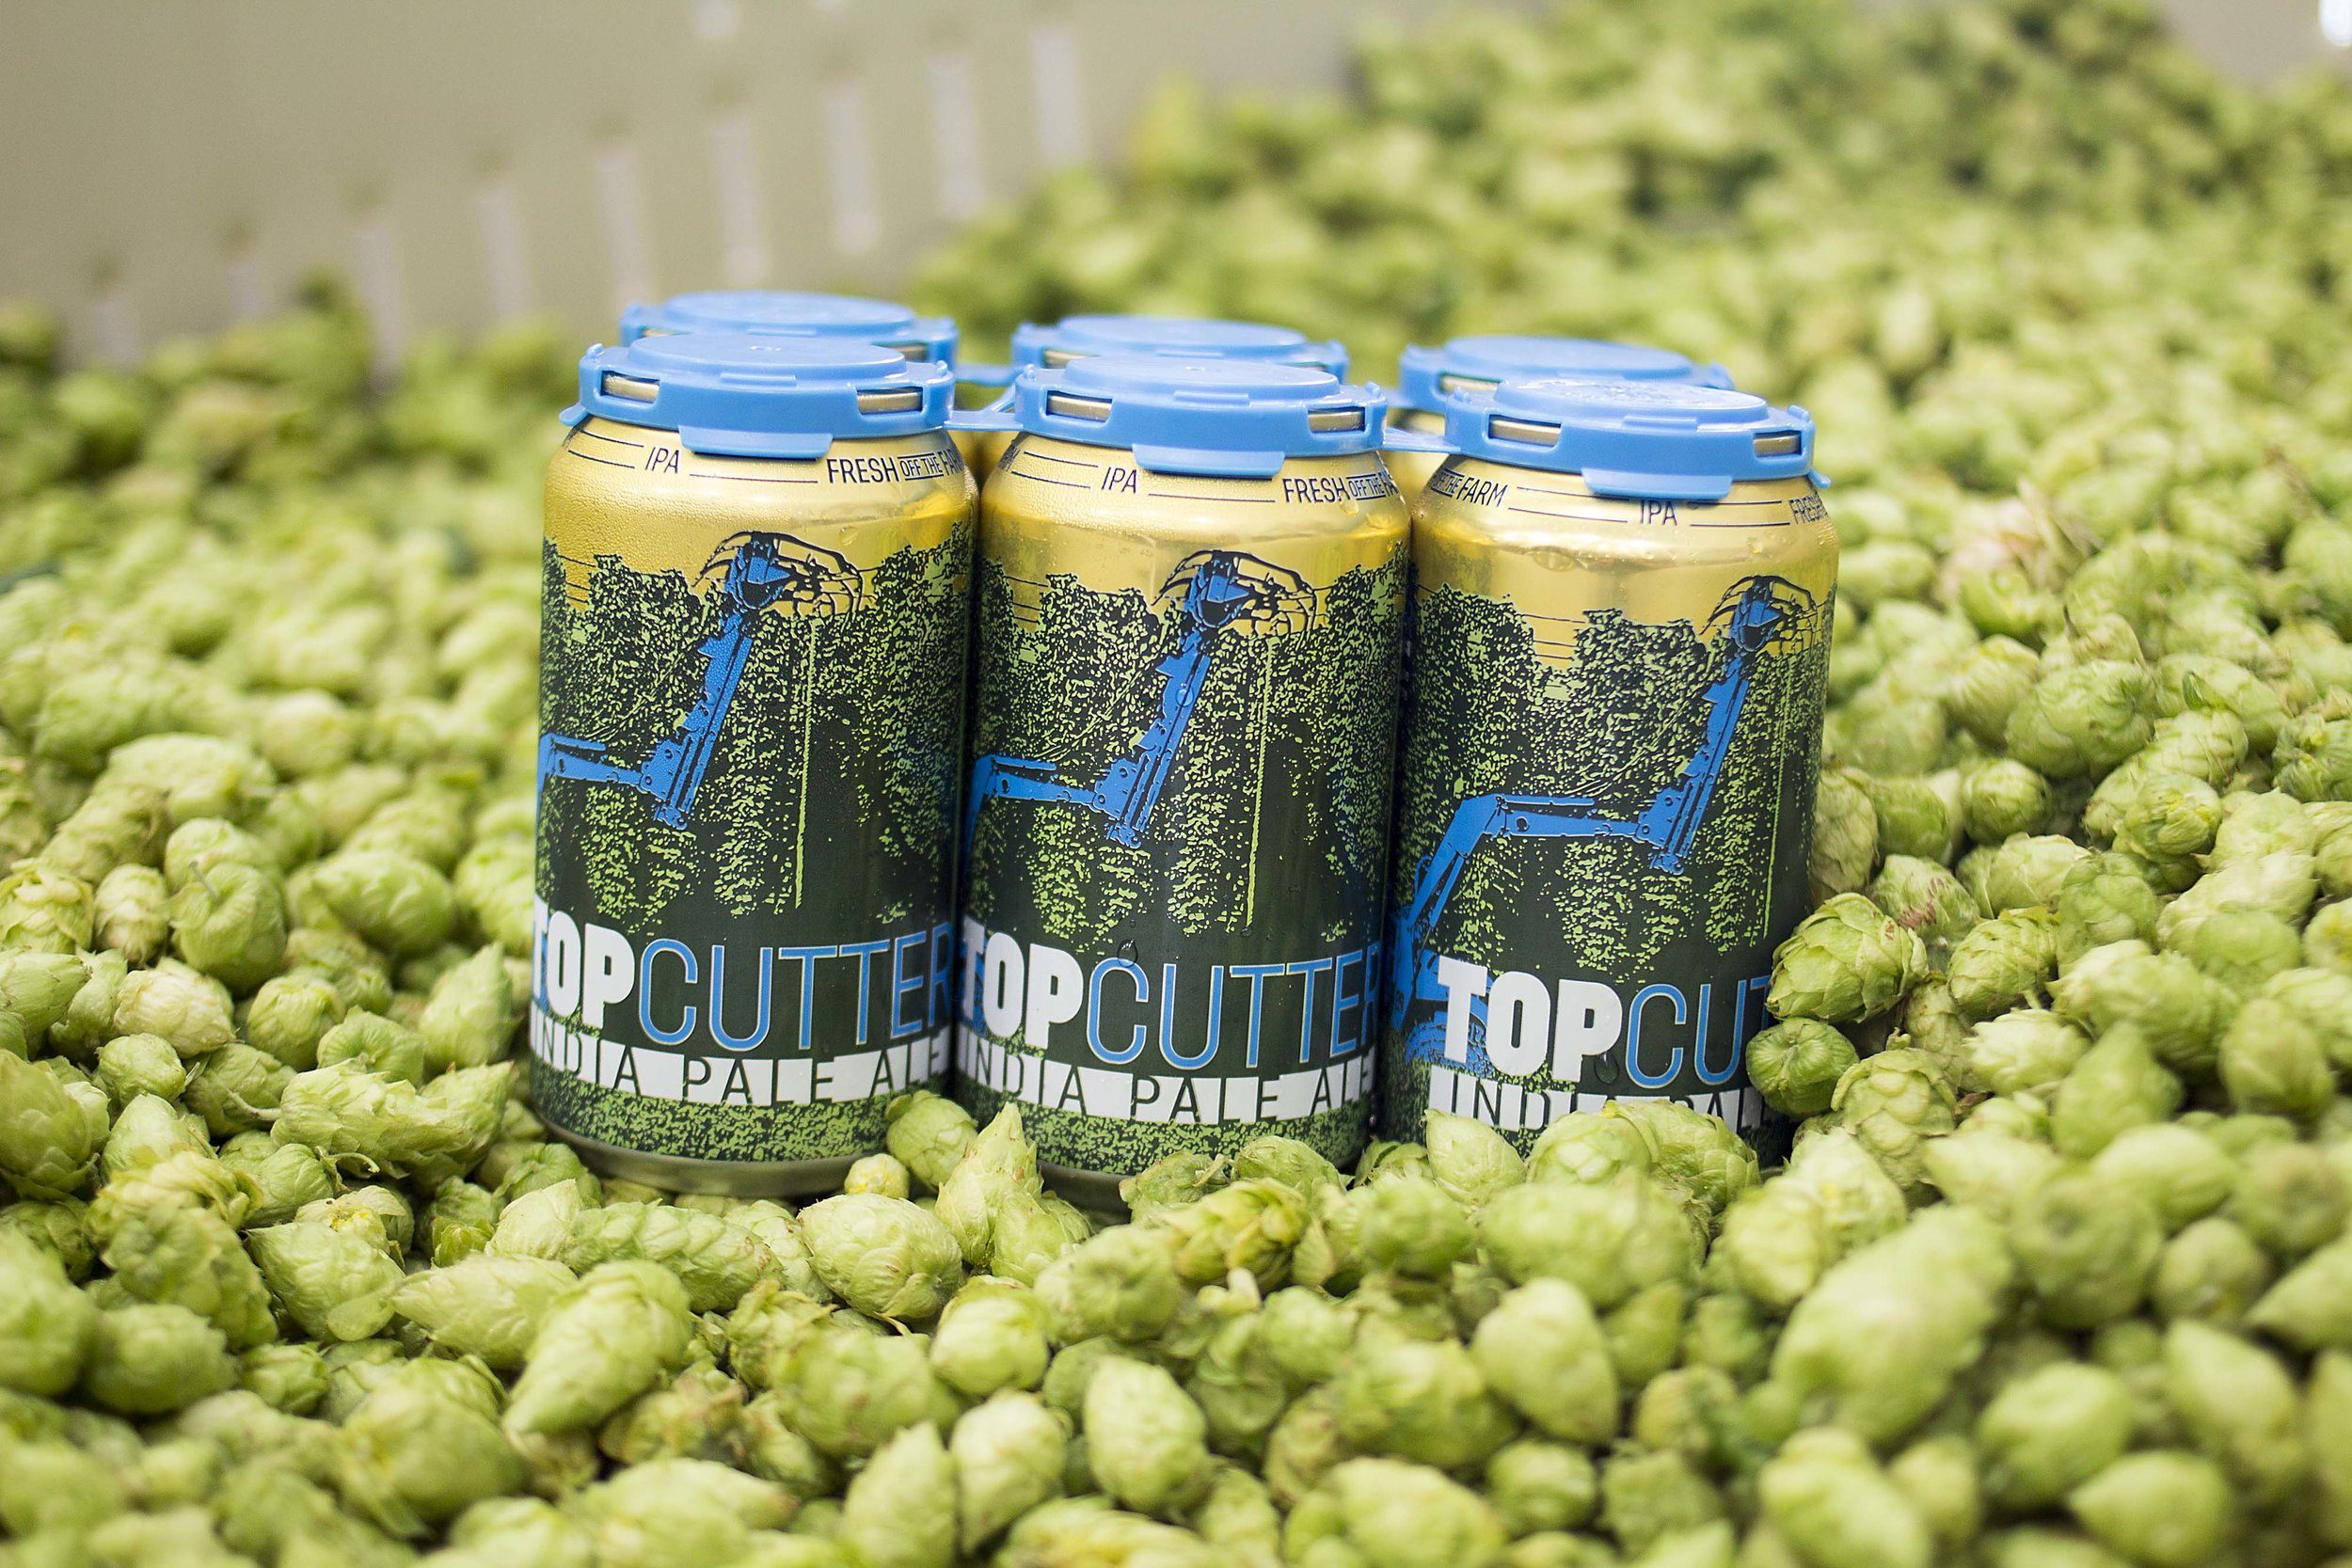 Top Cutter Bale Breaker Brewing Company Craft Beer Yakima